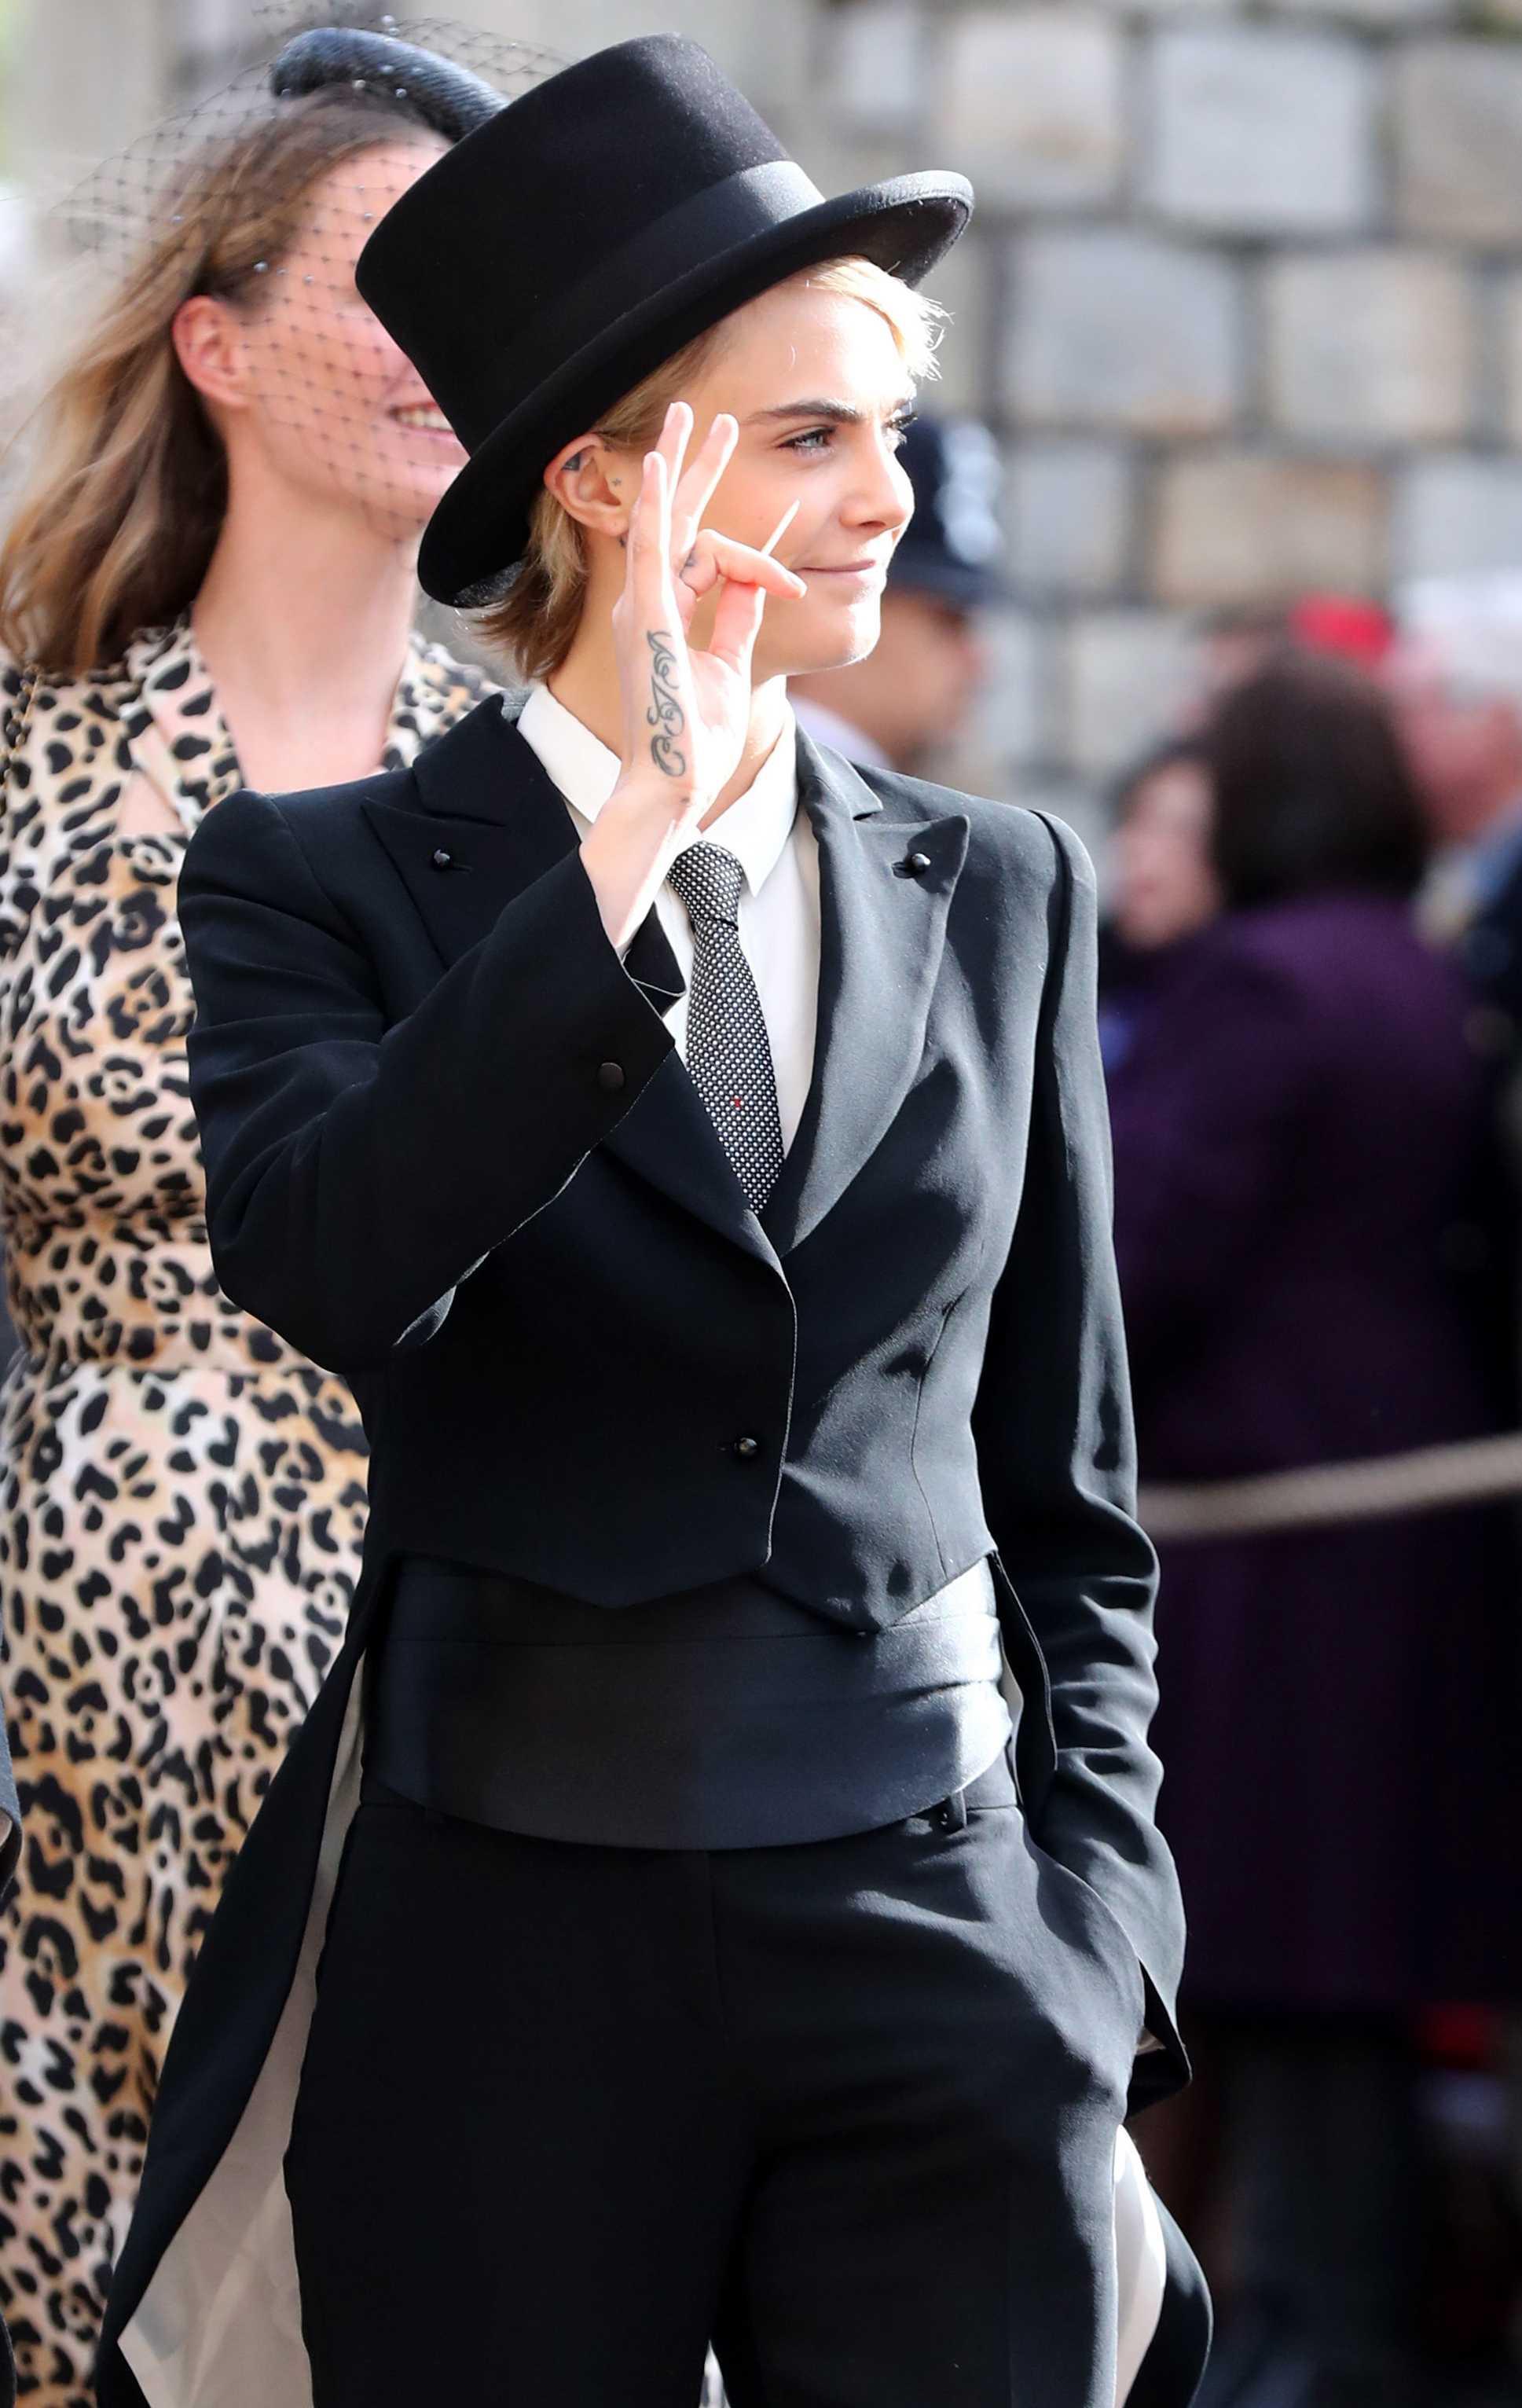 Princess Eugenie and Jack Brooksbank Wedding Cara Delevingne